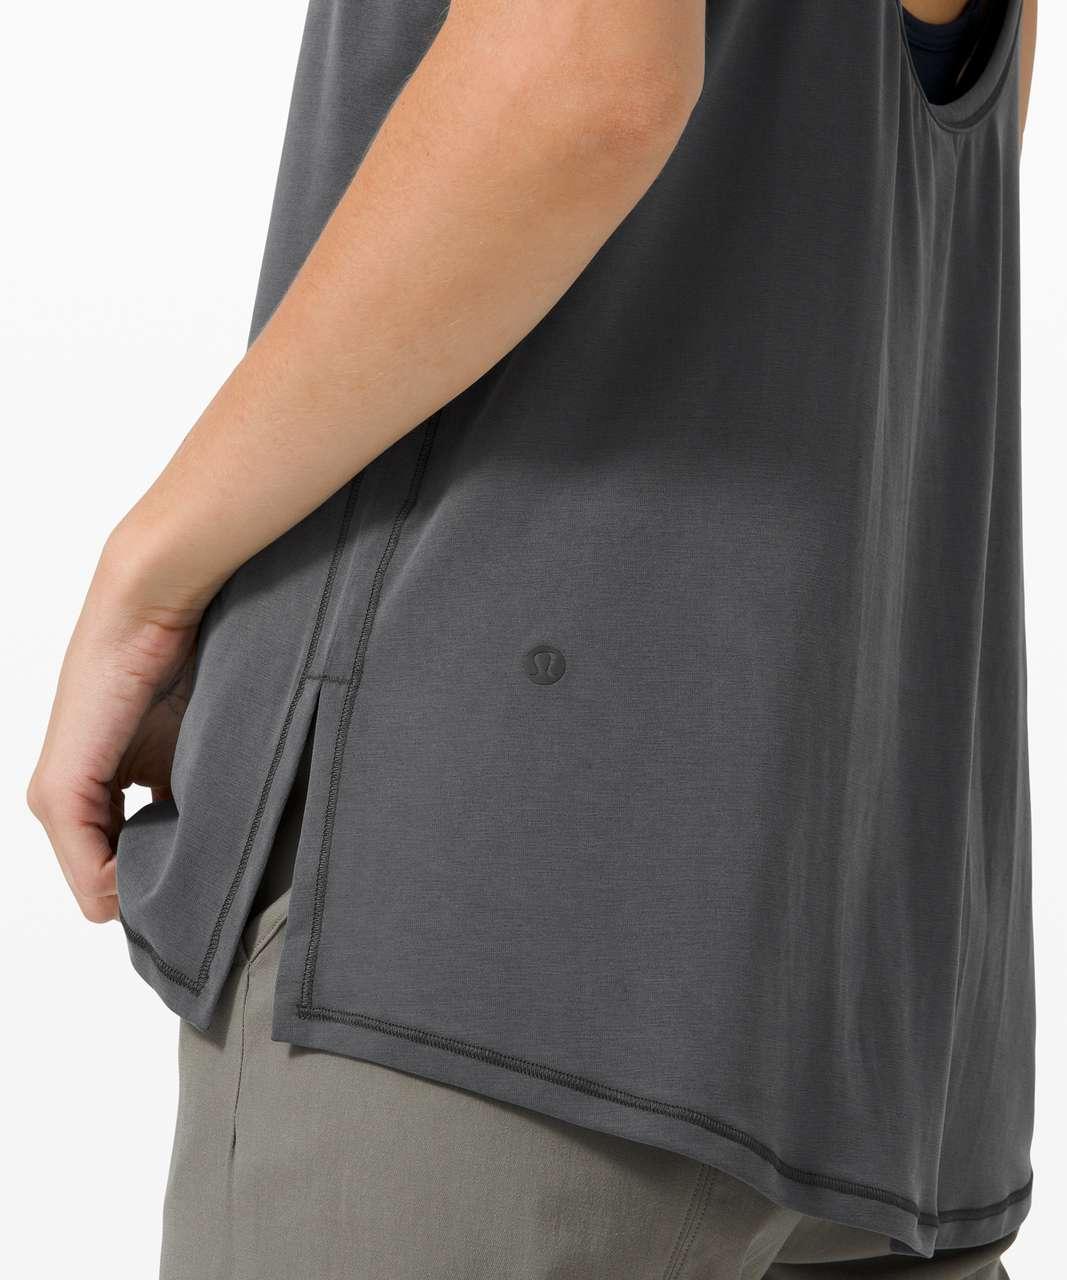 Lululemon Ease of It All Tank - Graphite Grey